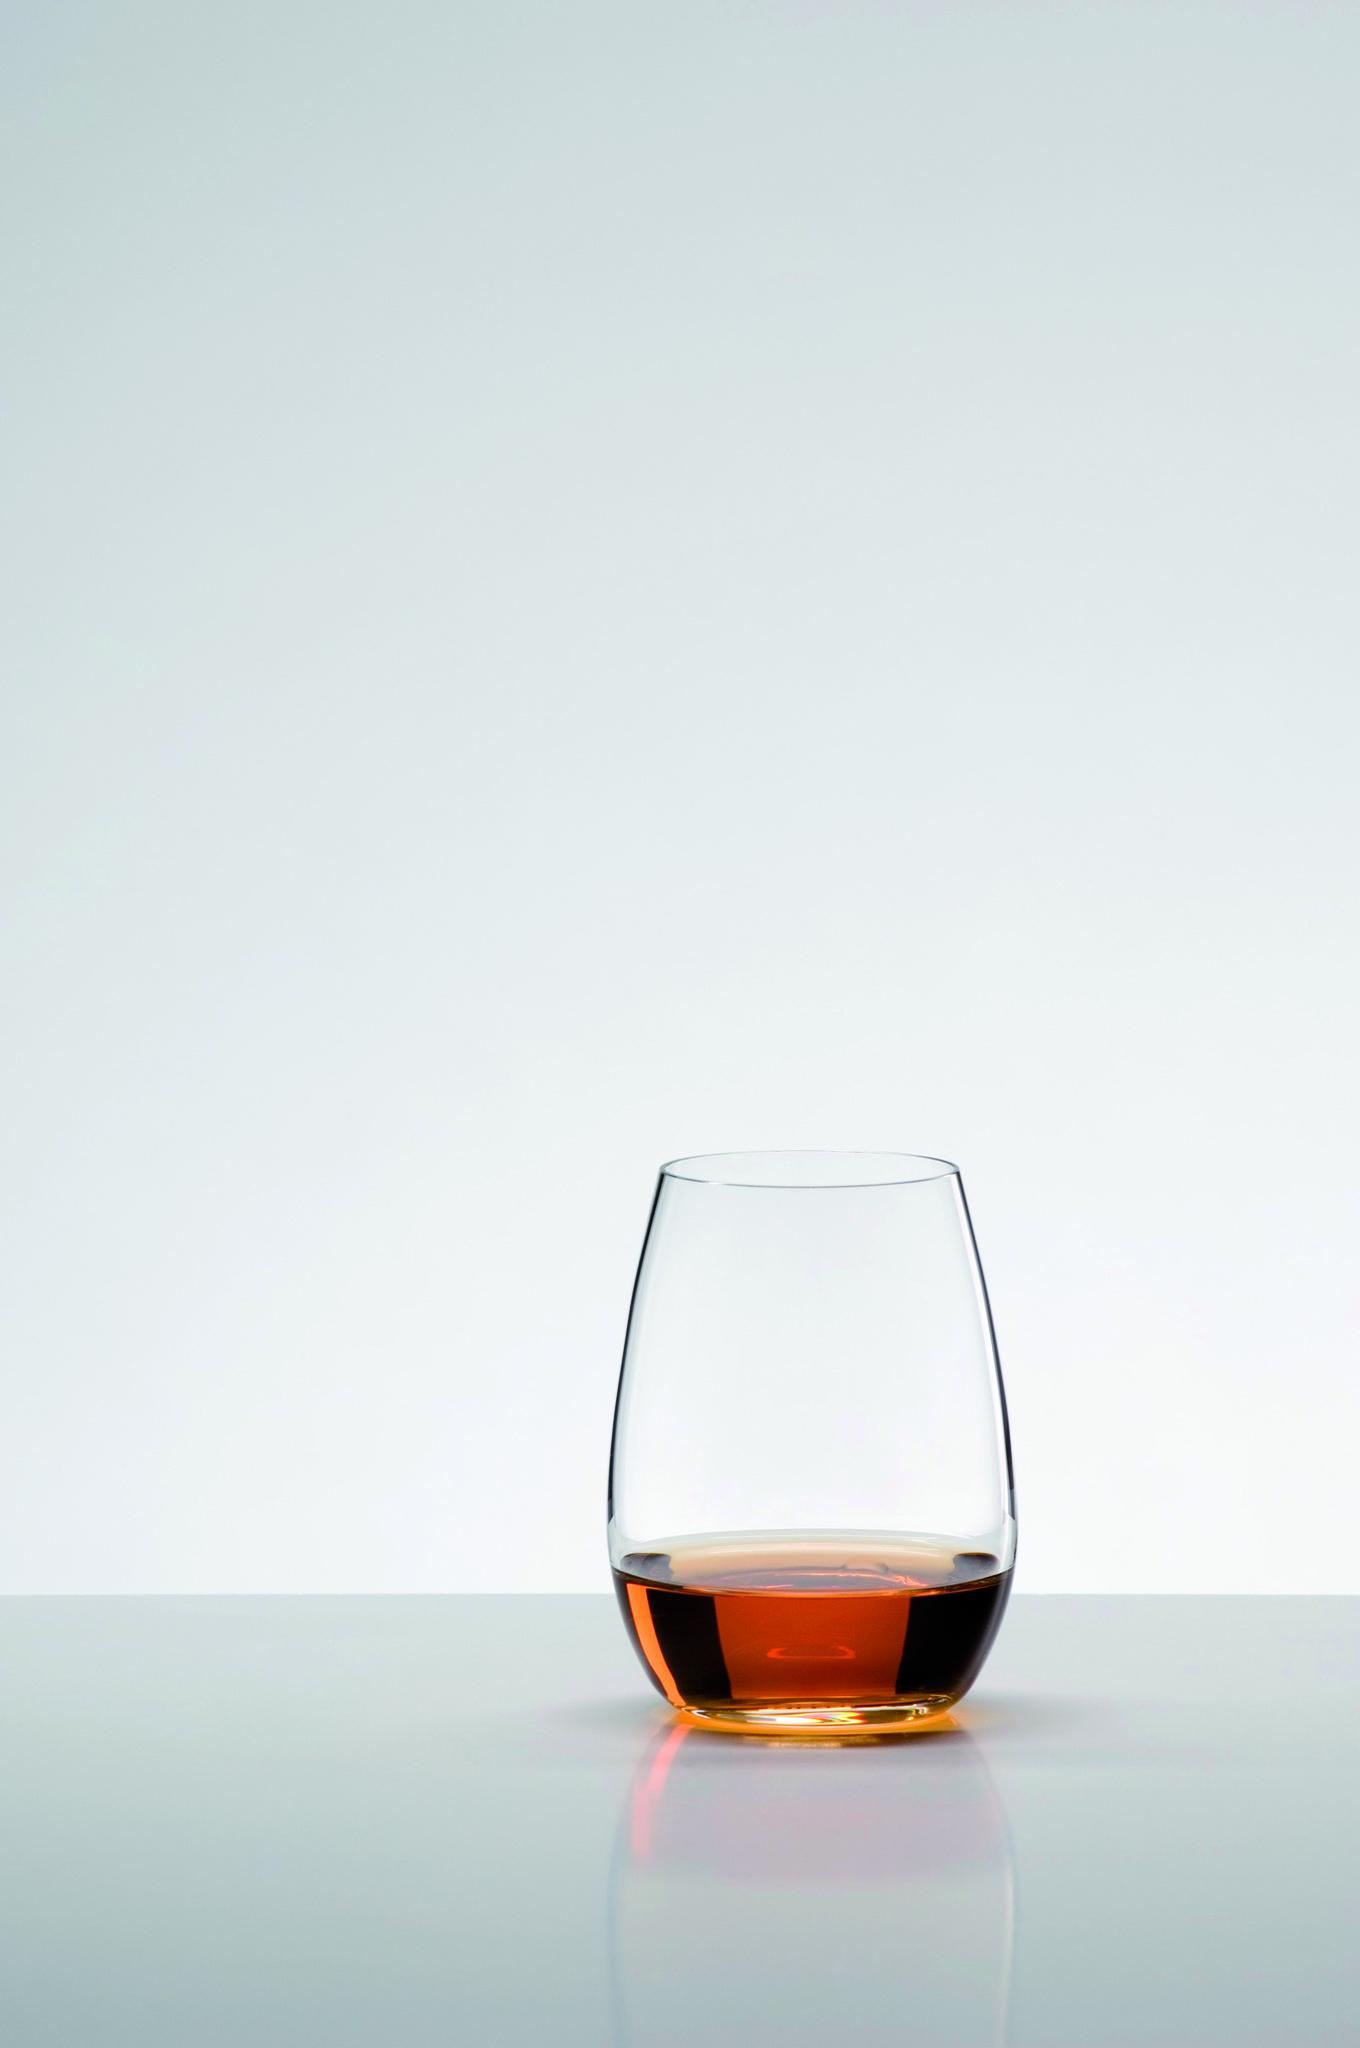 Бокалы Набор бокалов для крепких напитков 2шт 230мл Riedel The O Wine Tumbler Spirits nabor-bokalov-dlya-krepkih-napitkov-2-sht-600-ml-riedel-the-o-wine-tumbler-spirits-avstriya.jpg